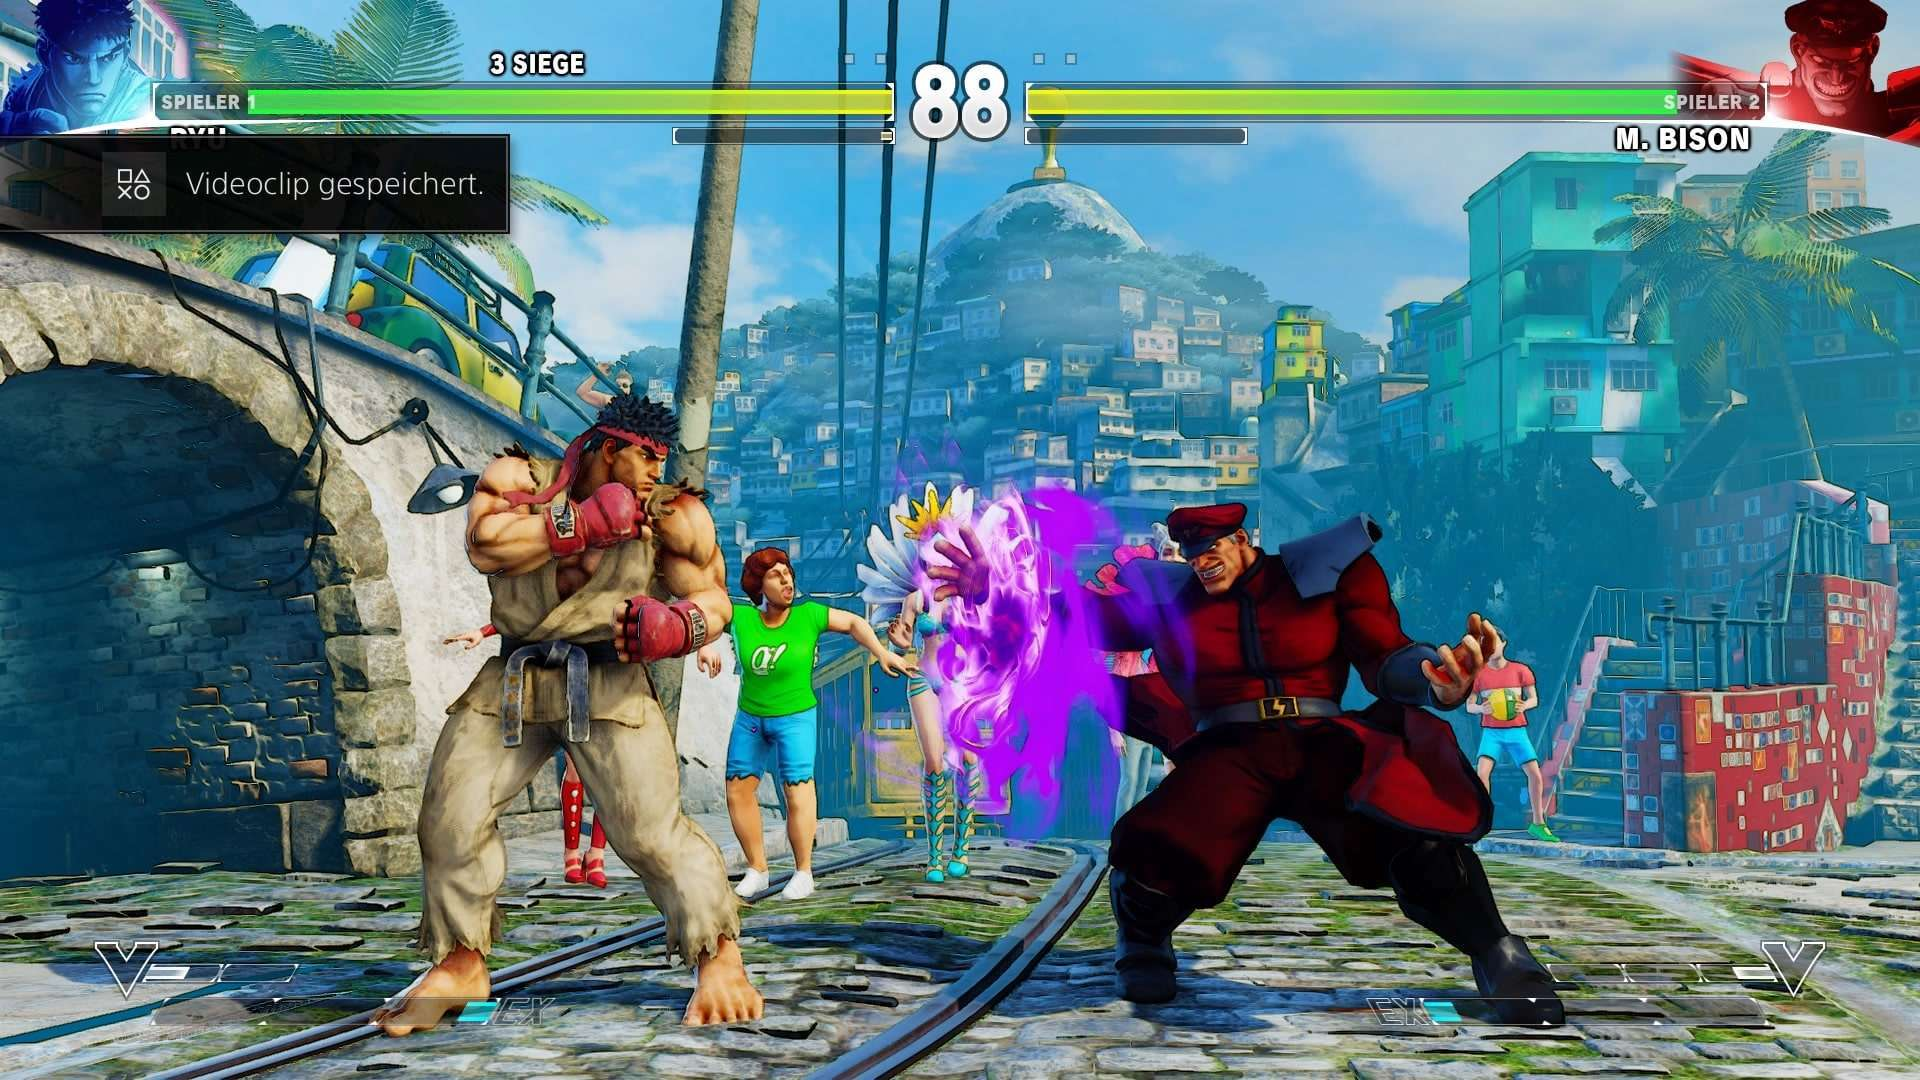 Hadoken strikes again – Street Fighter V (PS4) kurz angespielt 21 techboys.de • smarte News, auf den Punkt! Hadoken strikes again – Street Fighter V (PS4) kurz angespielt